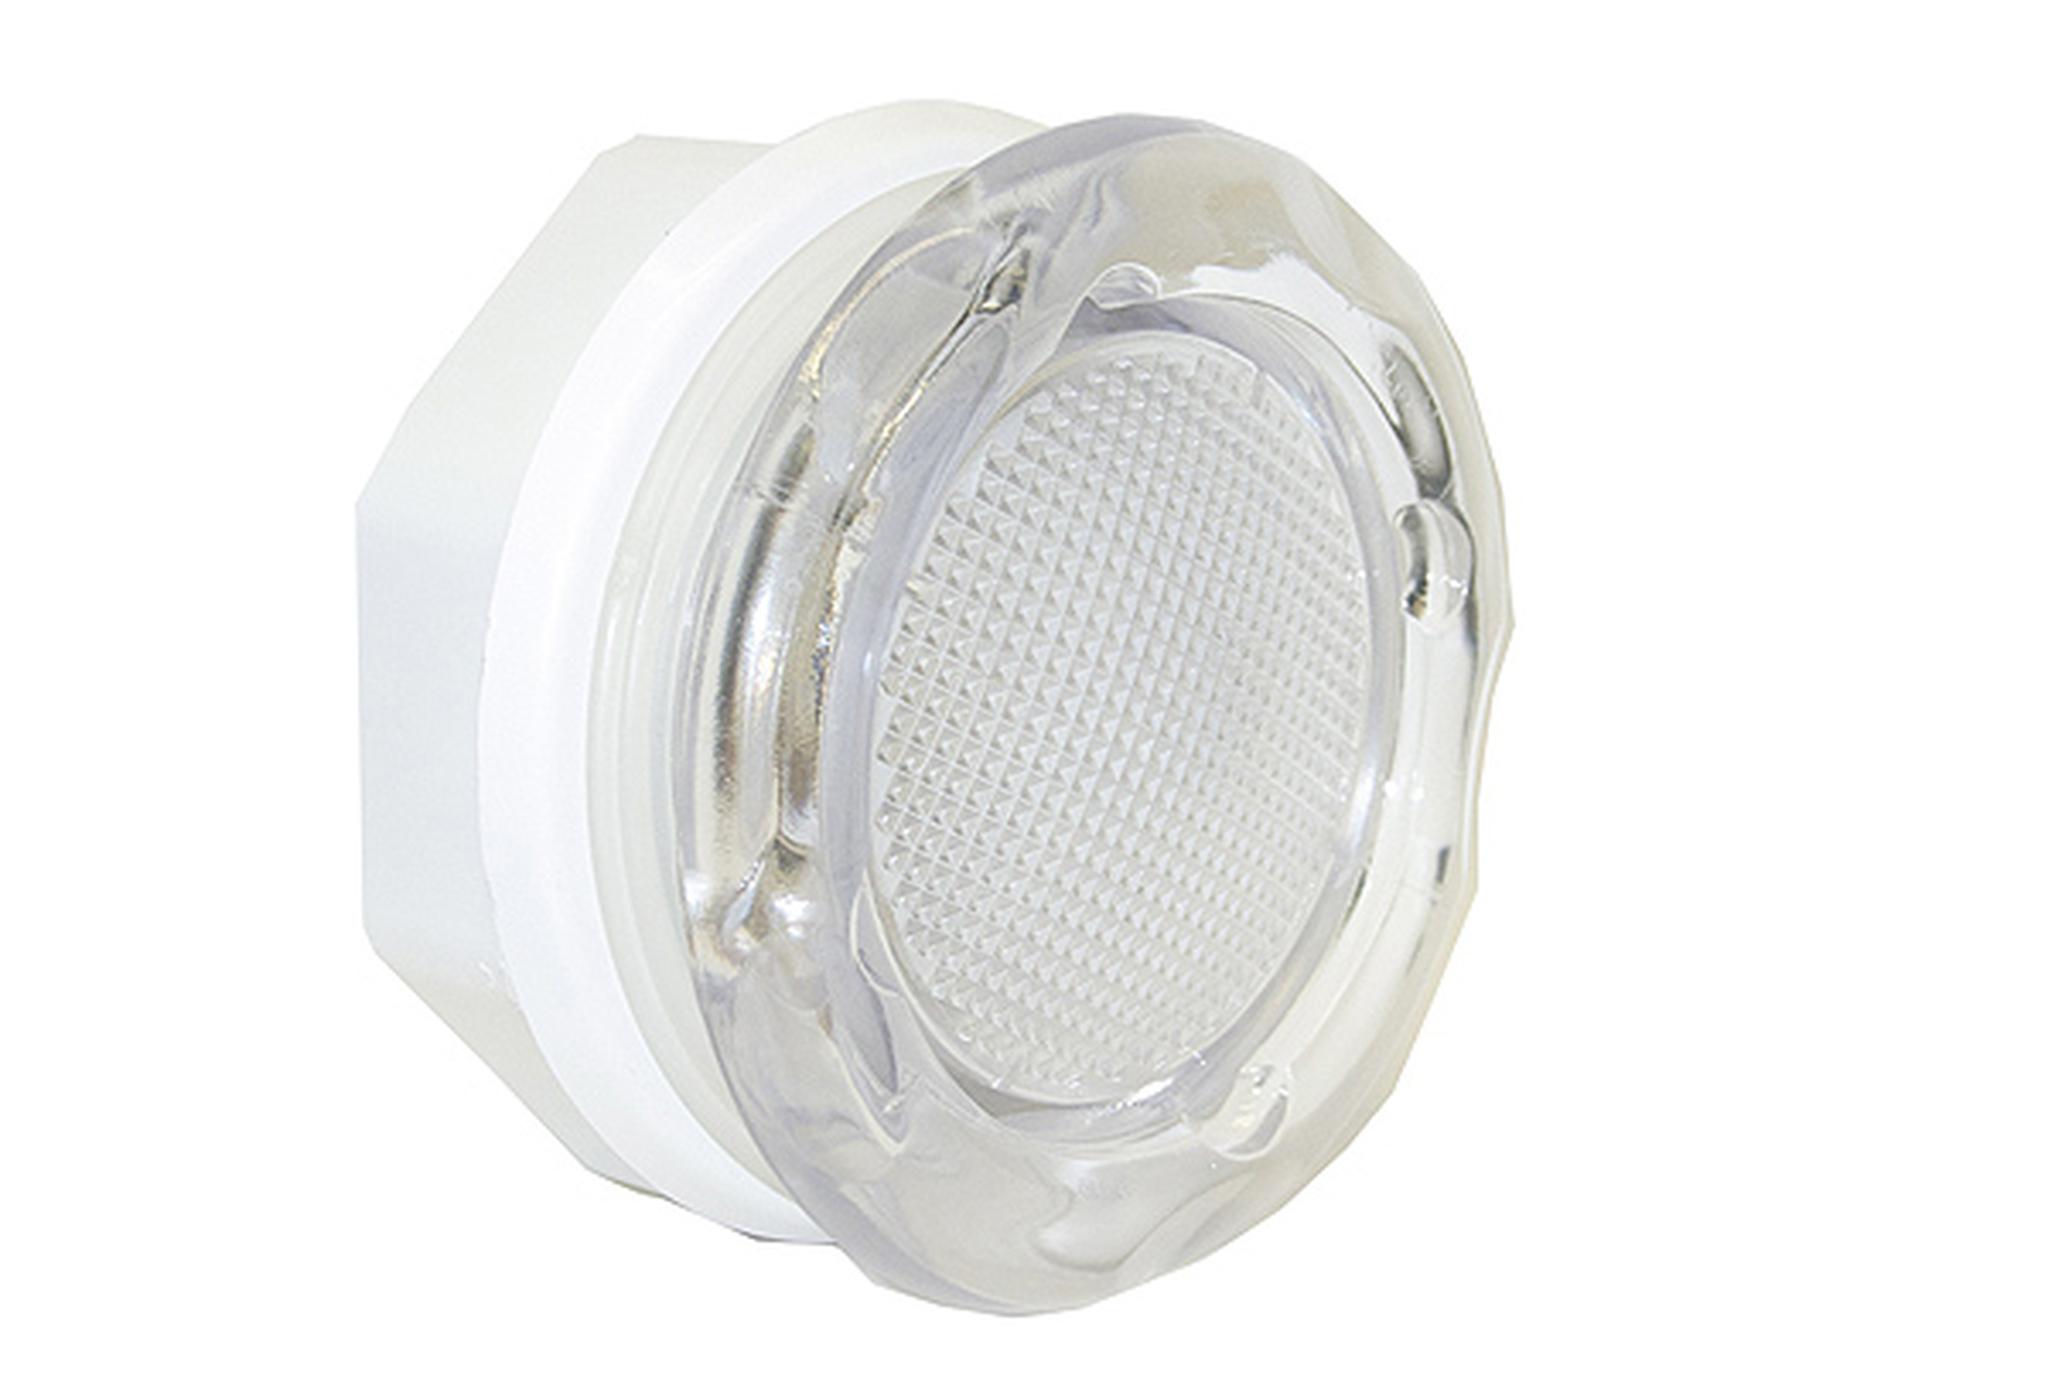 Lights & Light kits